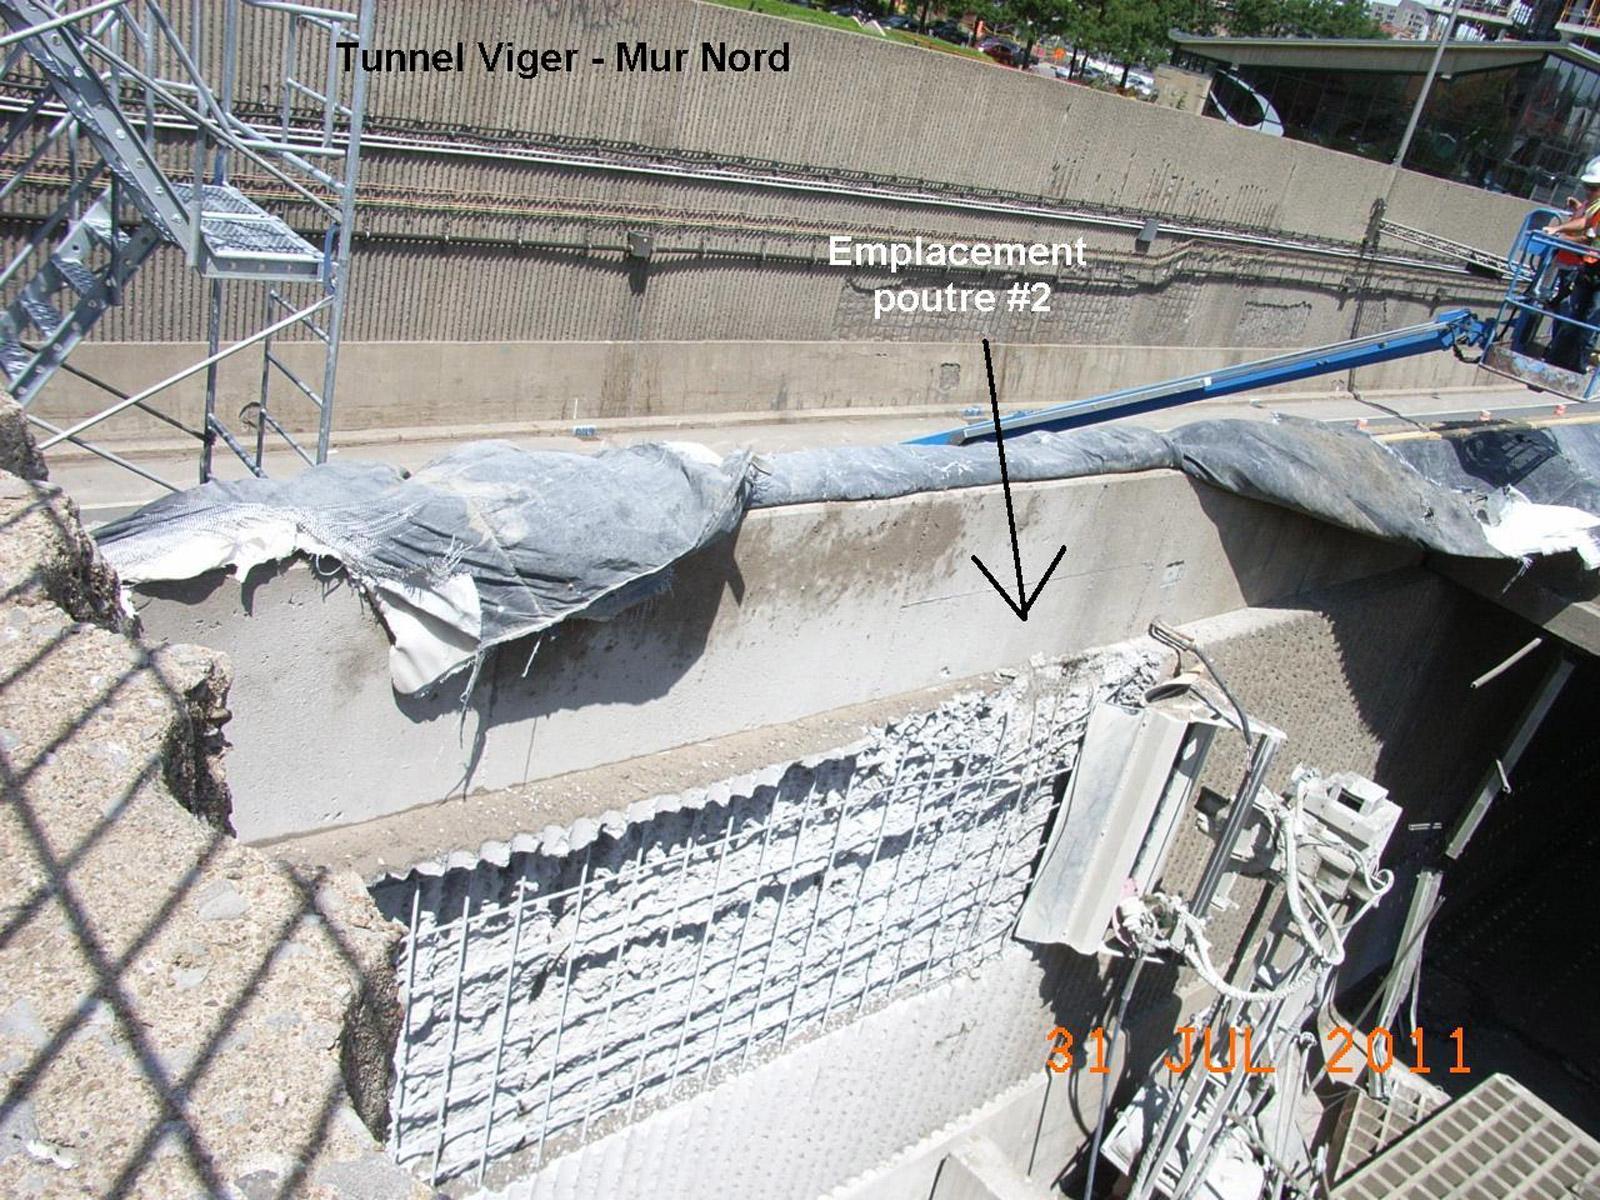 http://www.radio-canada.ca/nouvelles/enprofondeur/national/pont-montreal/tunnel_viger_mur_nord.jpg